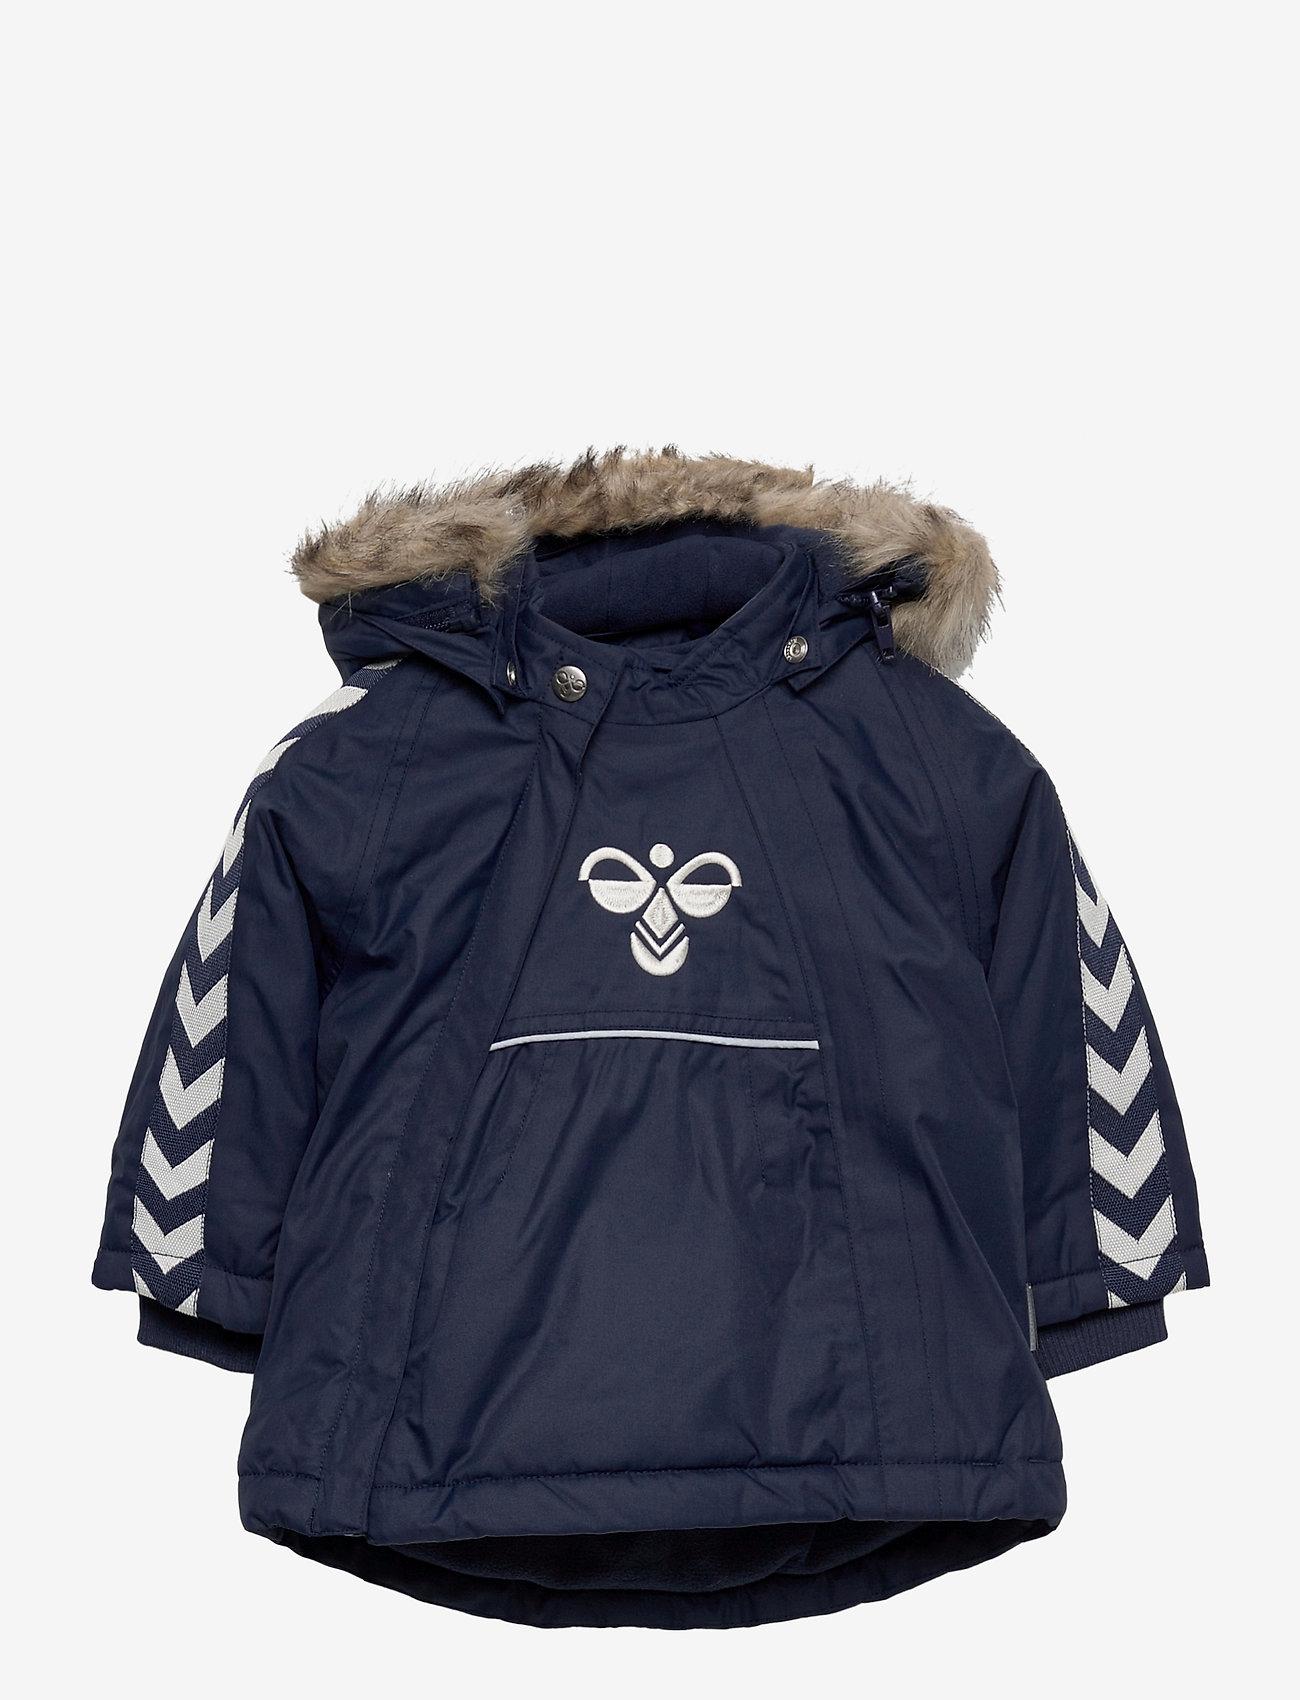 Hummel - hmlJESSIE JACKET - insulated jackets - black iris - 0